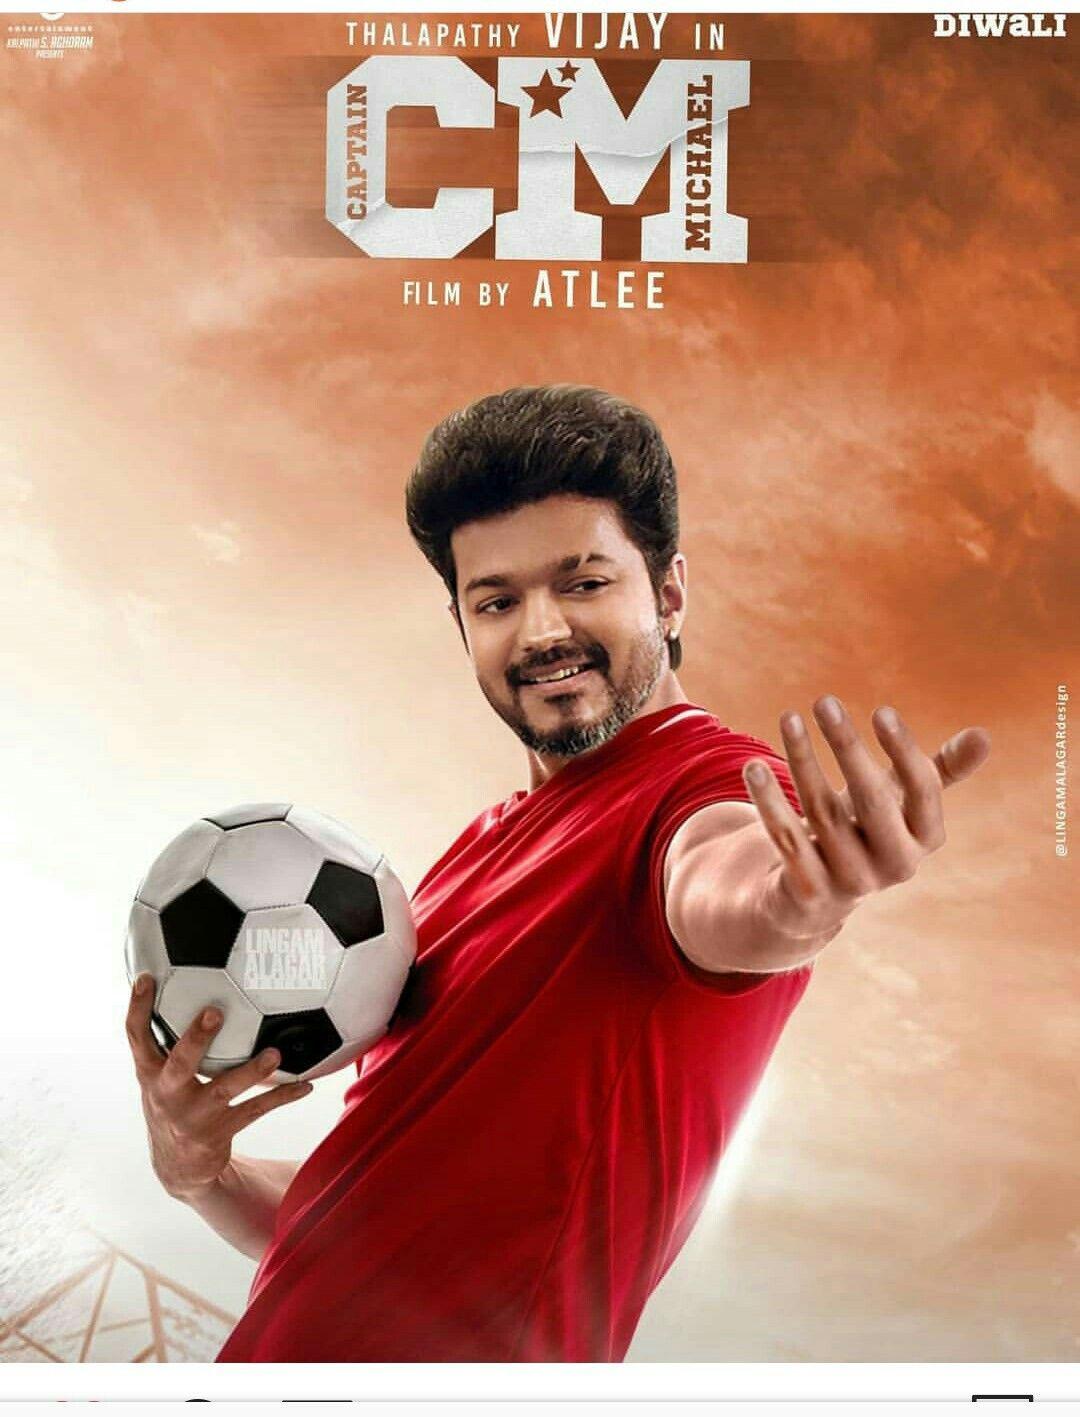 Thalapathy vijay 63 movie New poster